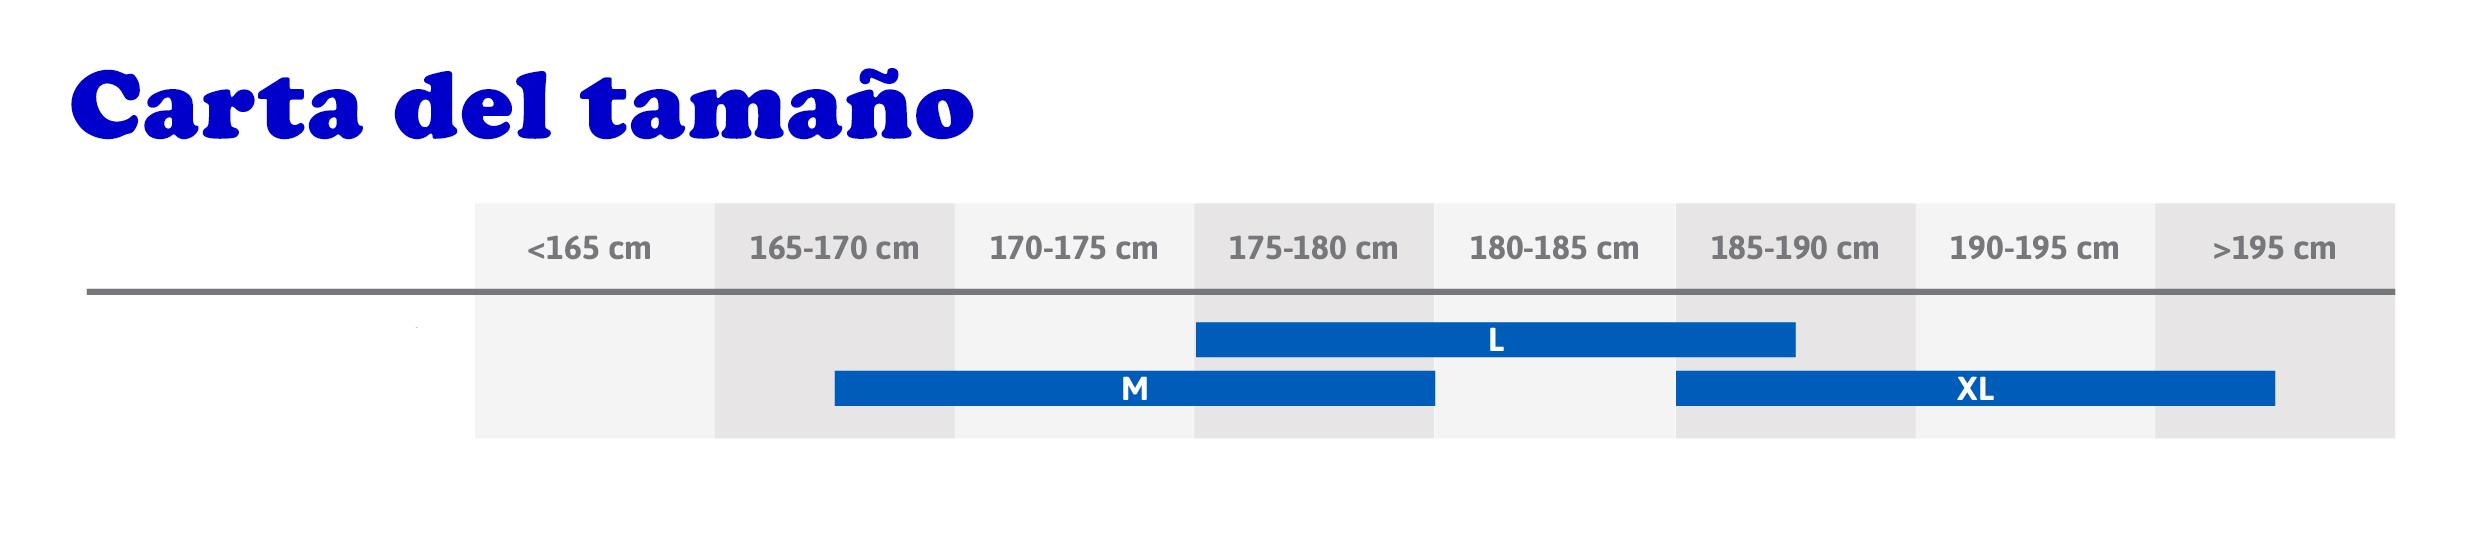 Carta de medidas de bicicletas según talla